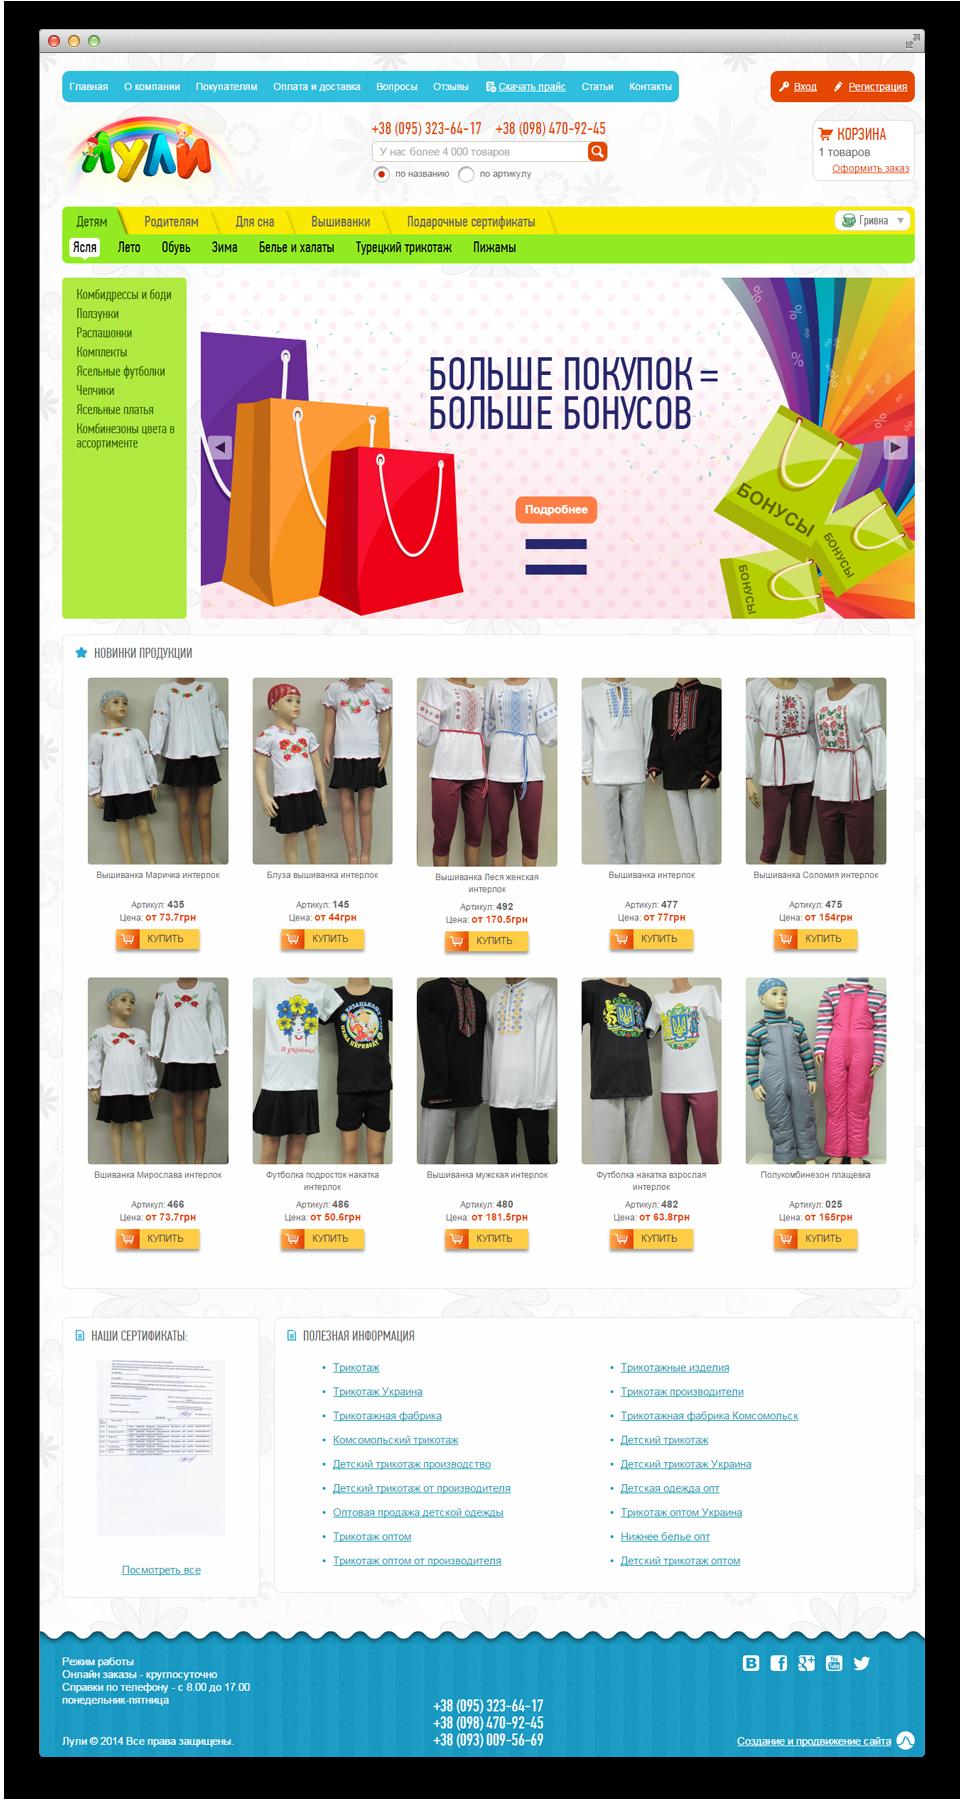 Редизайн интернет-магазина трикотажа